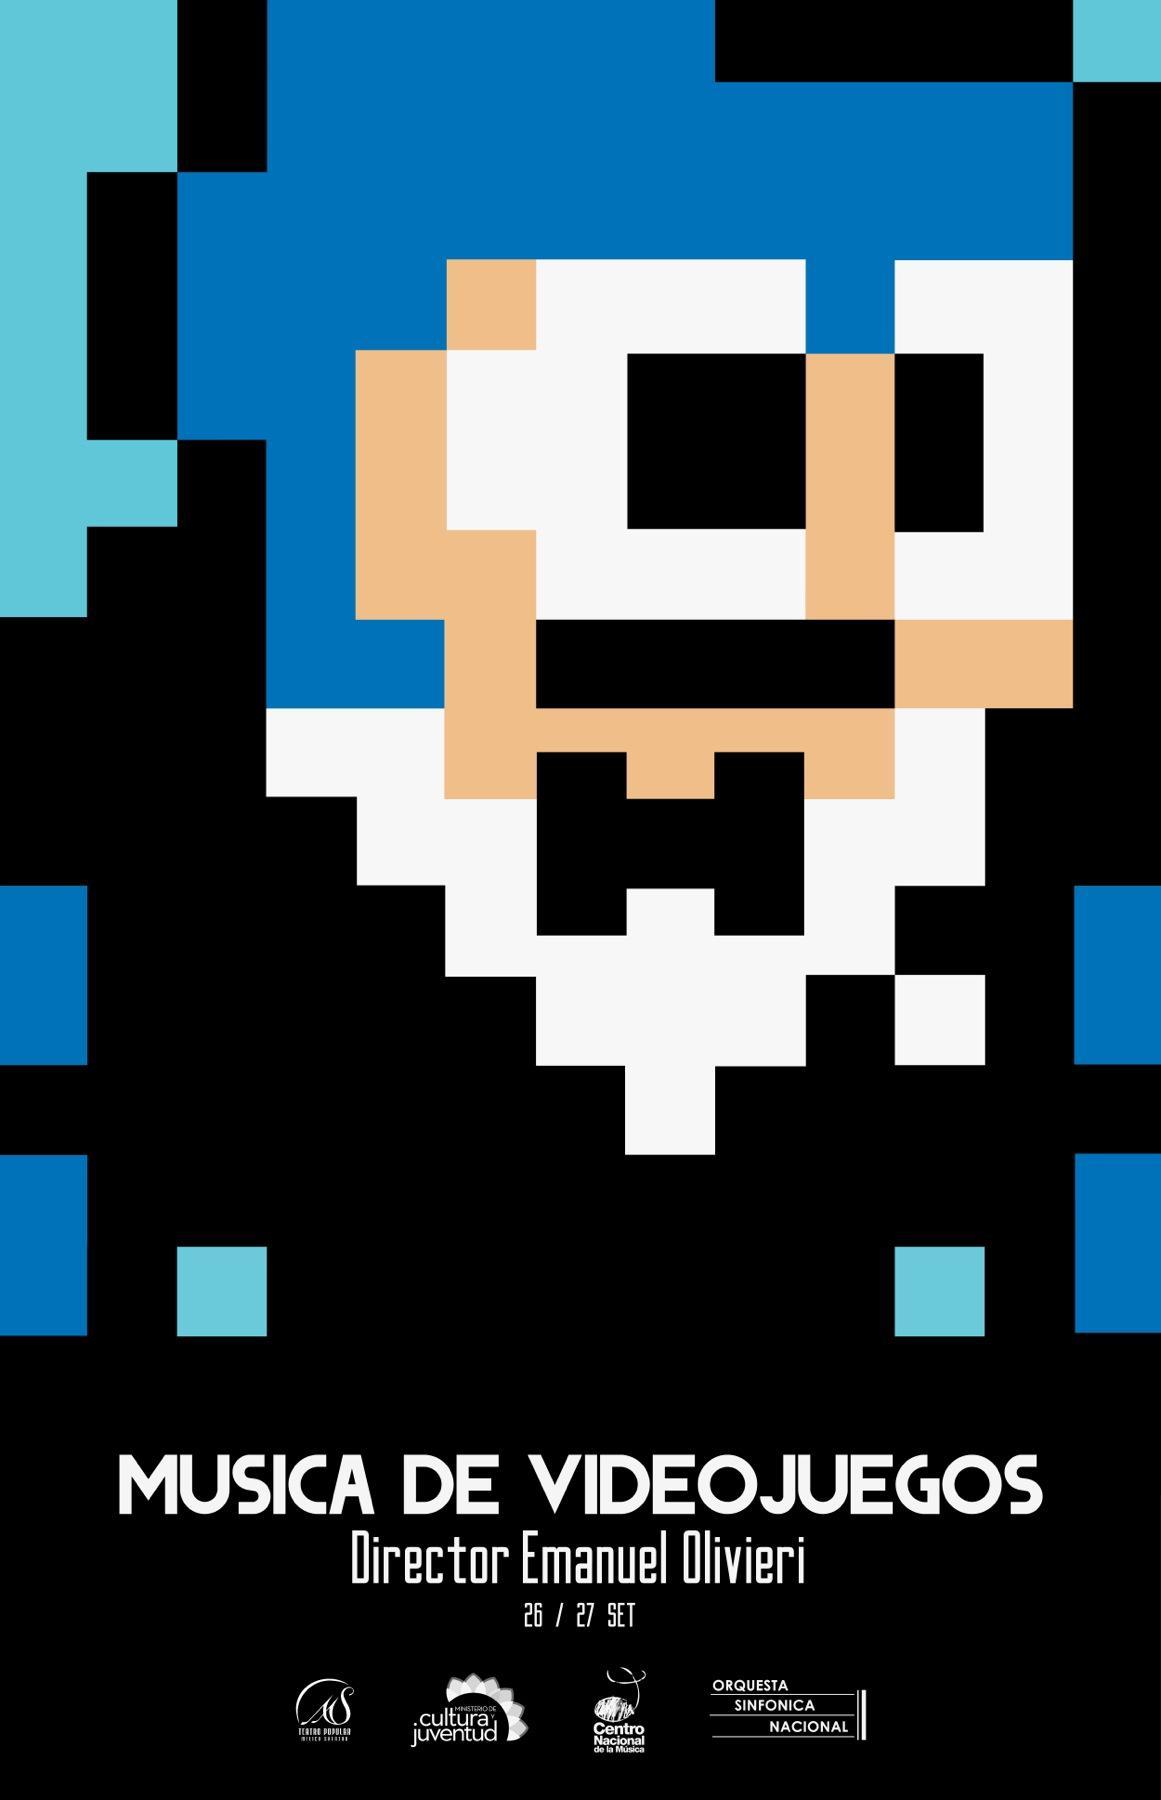 Orquesta Sinfónica Nacional Print Ad -  Megaman